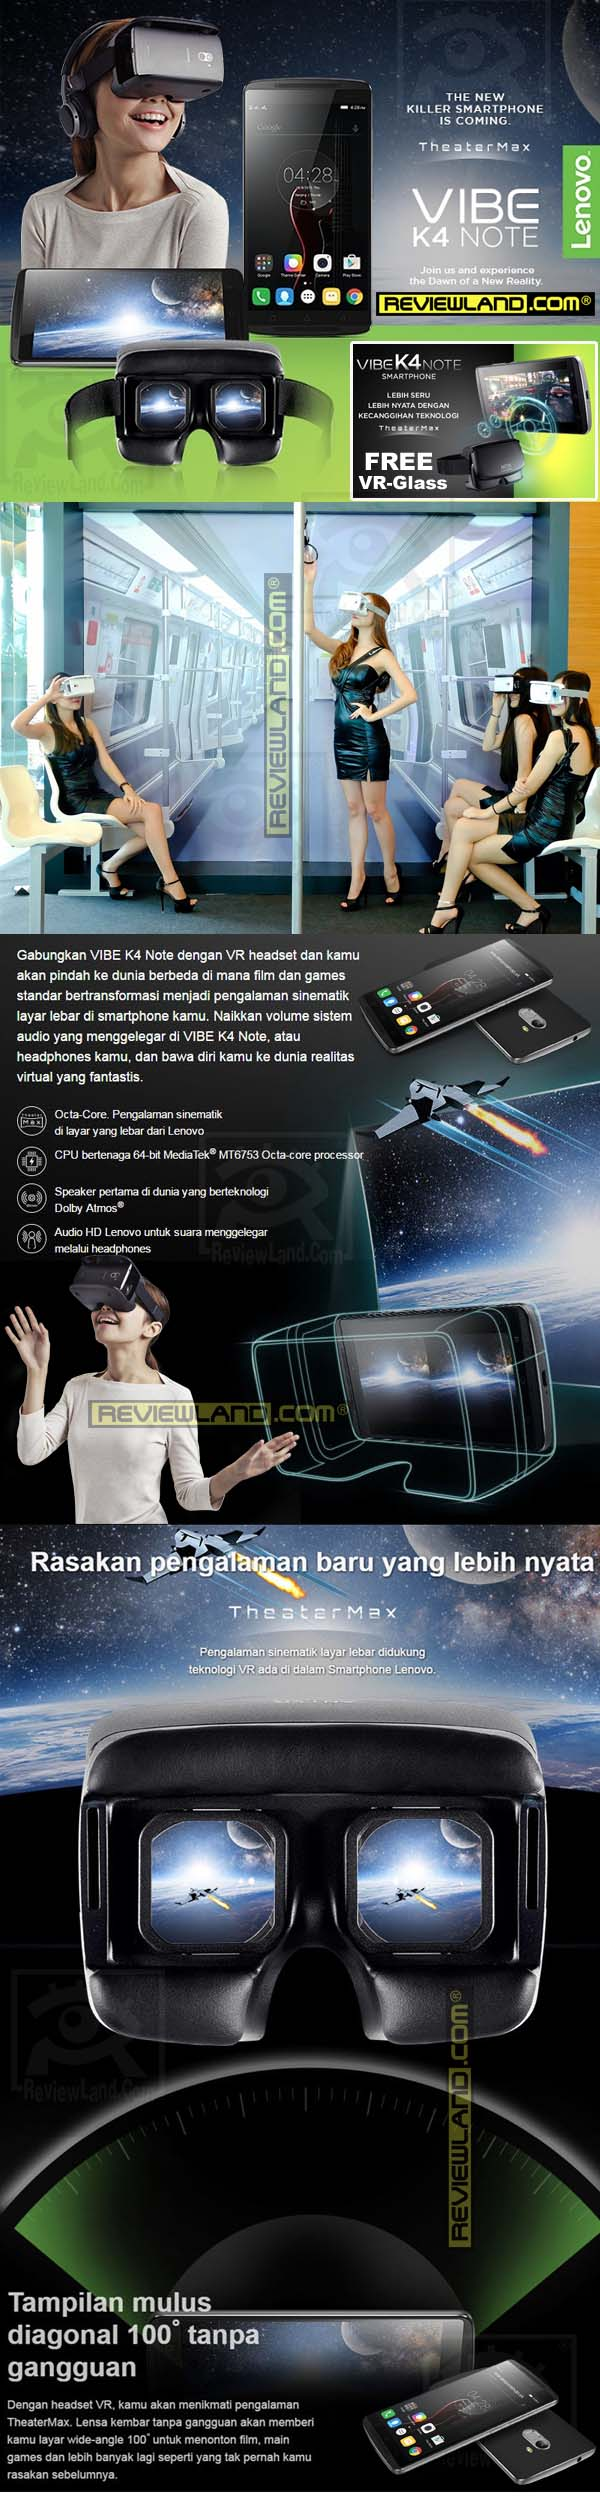 smartphone-lenovok4note-vr